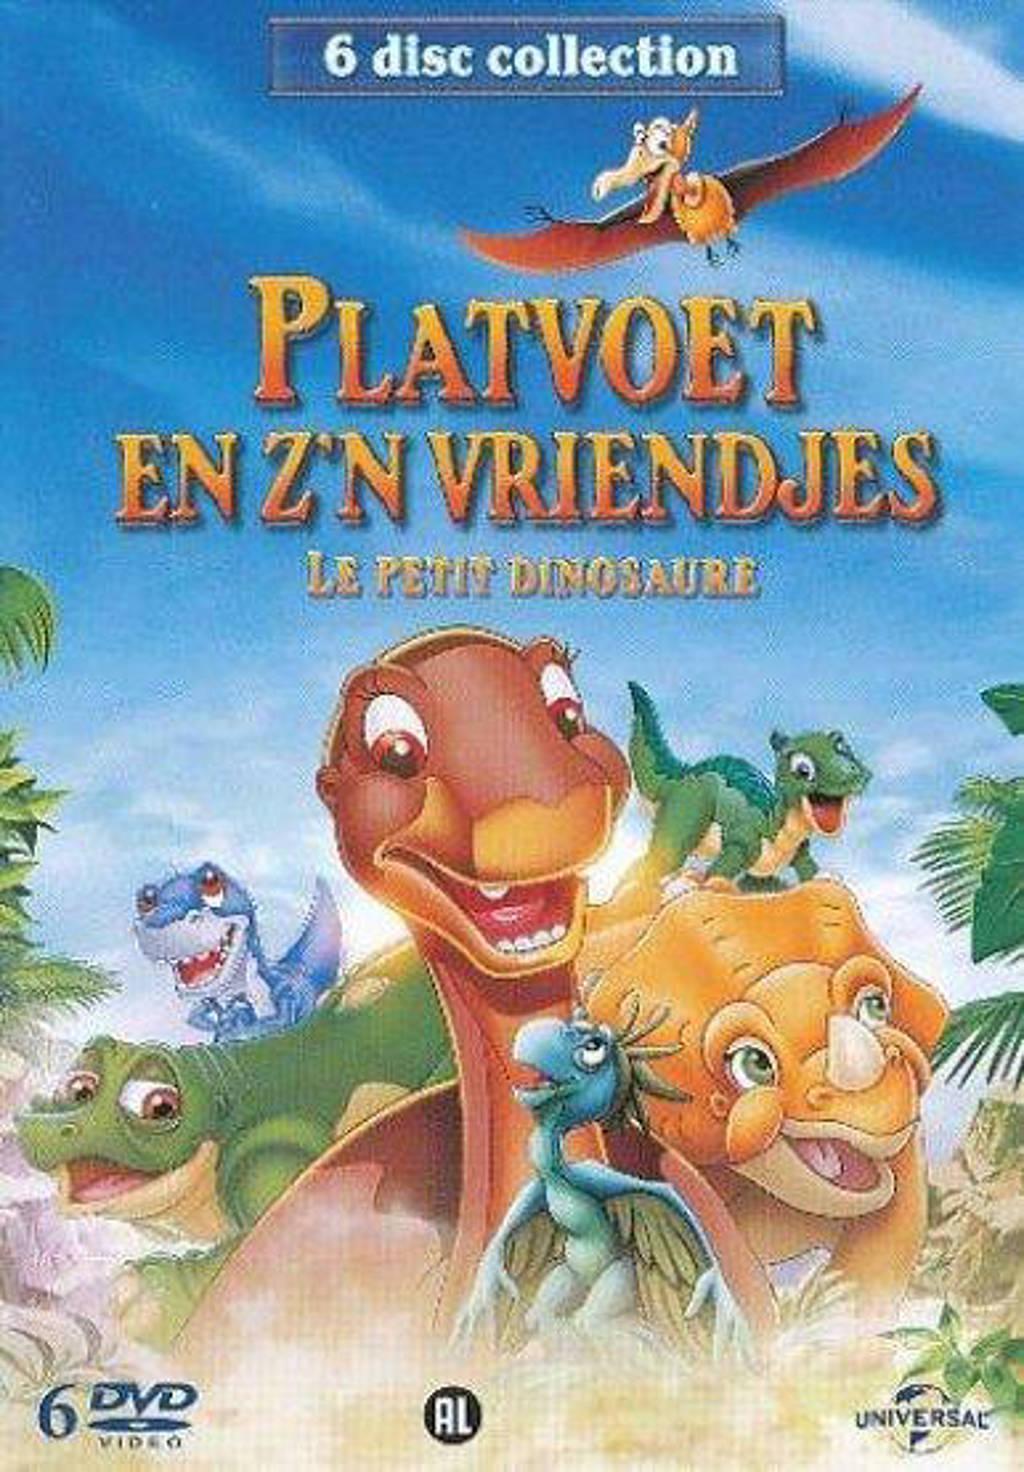 Platvoet 1-6 (DVD)